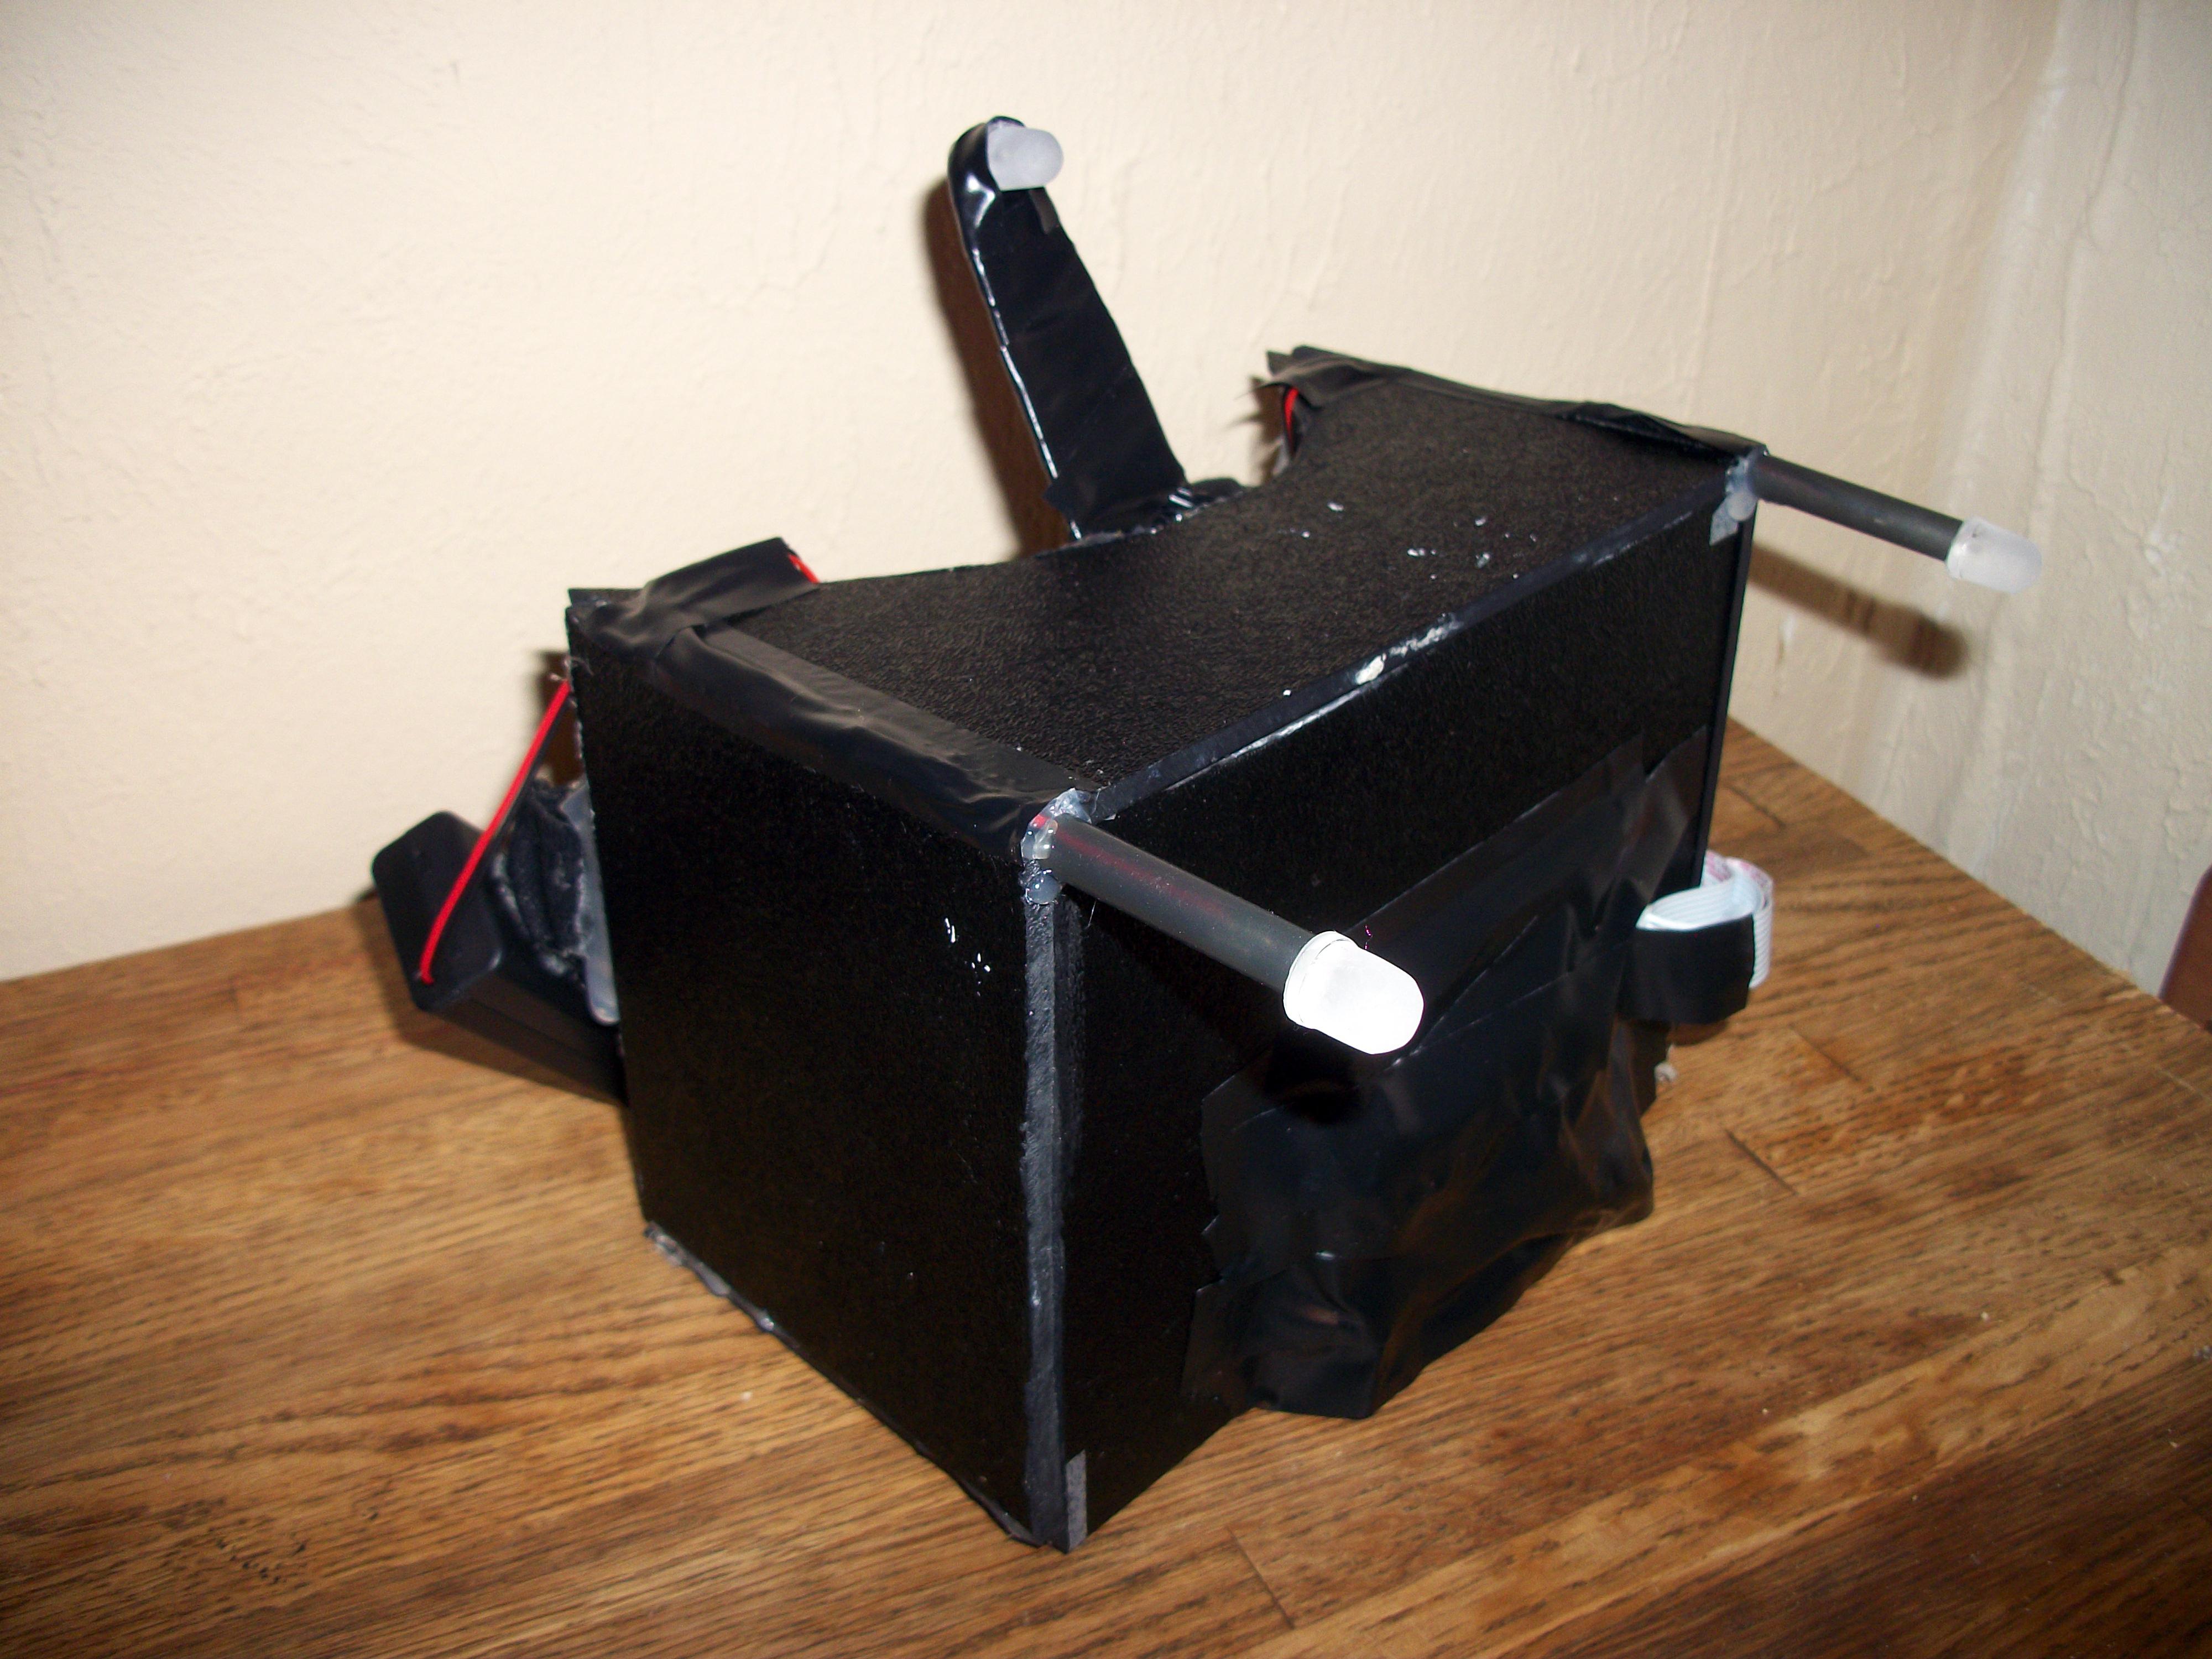 Picture of The Nova—A DIY Oculus Rift!